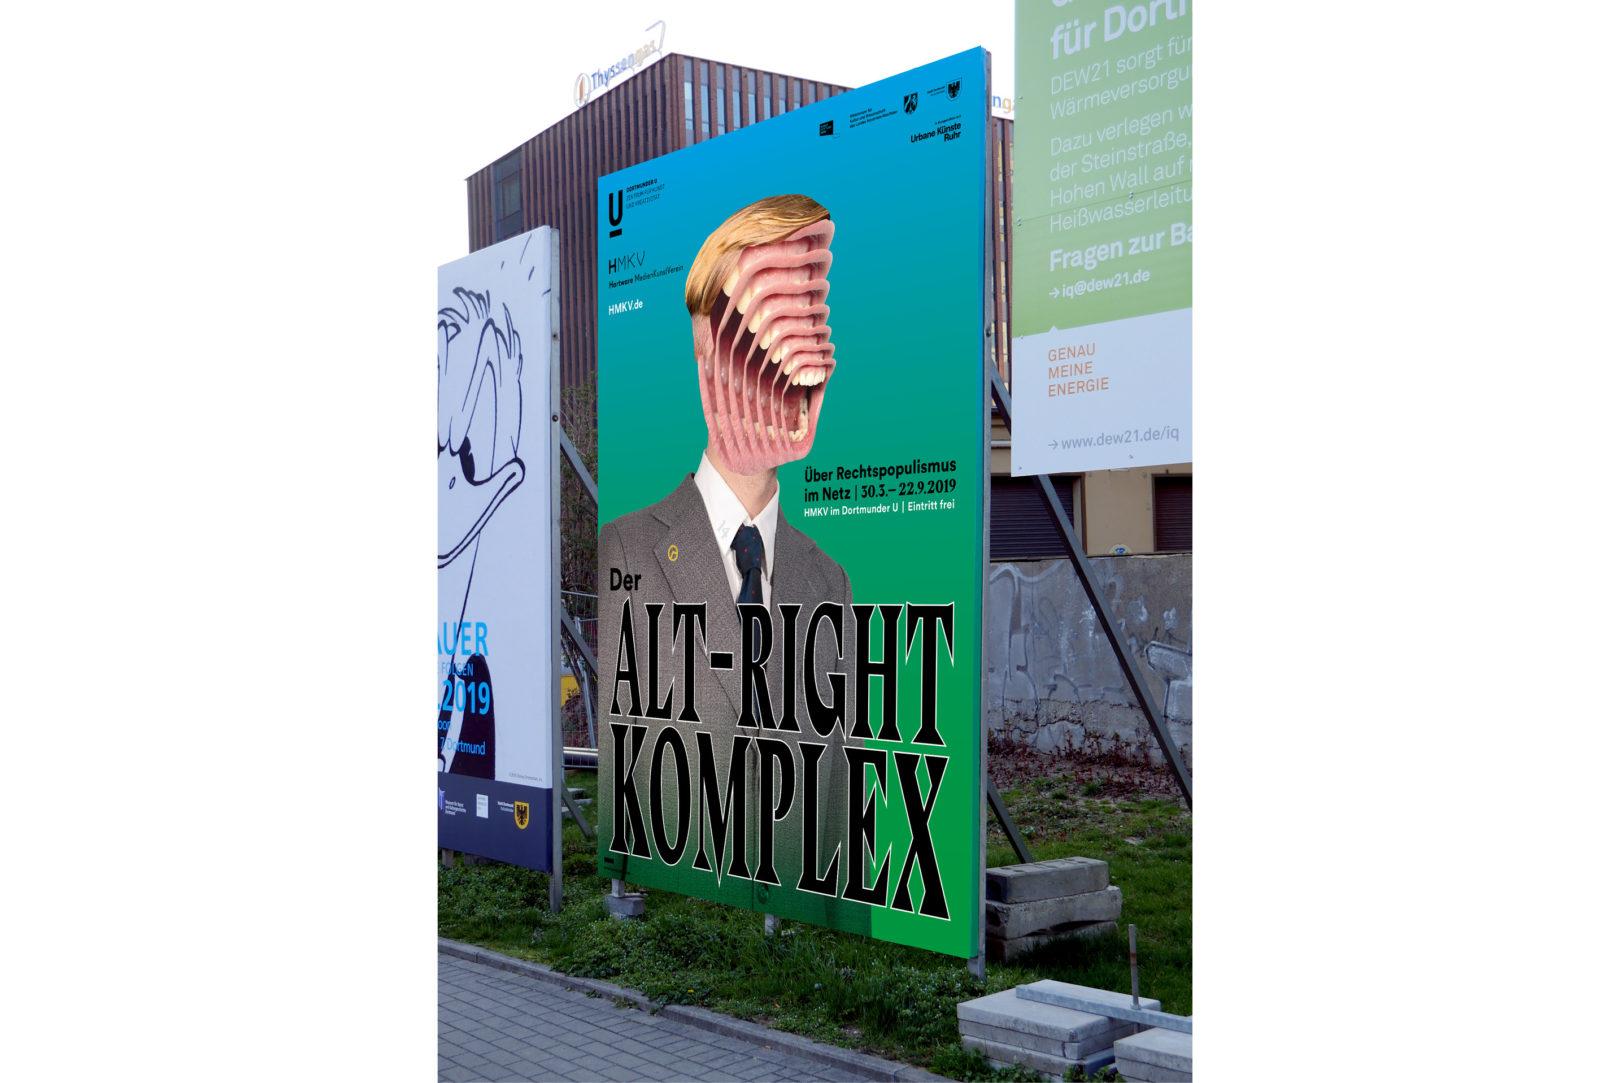 http://e-o-t.de/wordpress/wp-content/uploads/2019/04/eot-AltRightKomplex-identity5.jpg